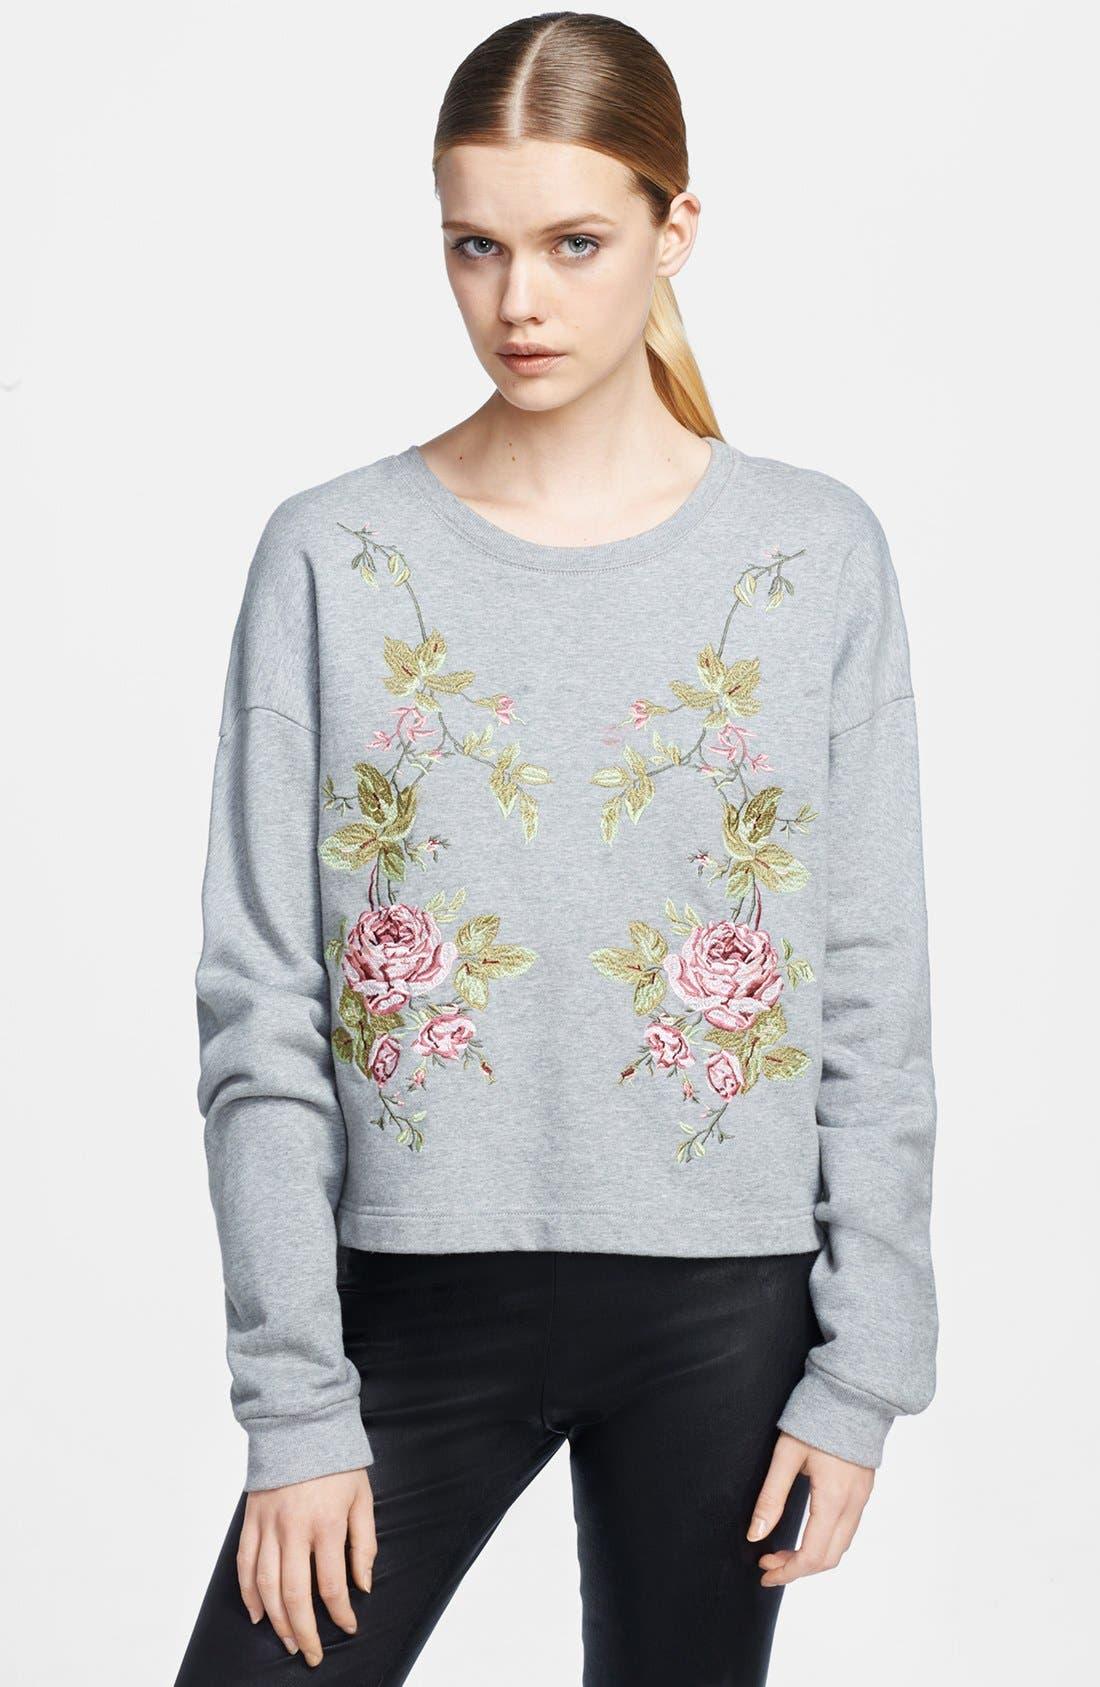 Main Image - McQ by Alexander McQueen Embroidered Sweatshirt